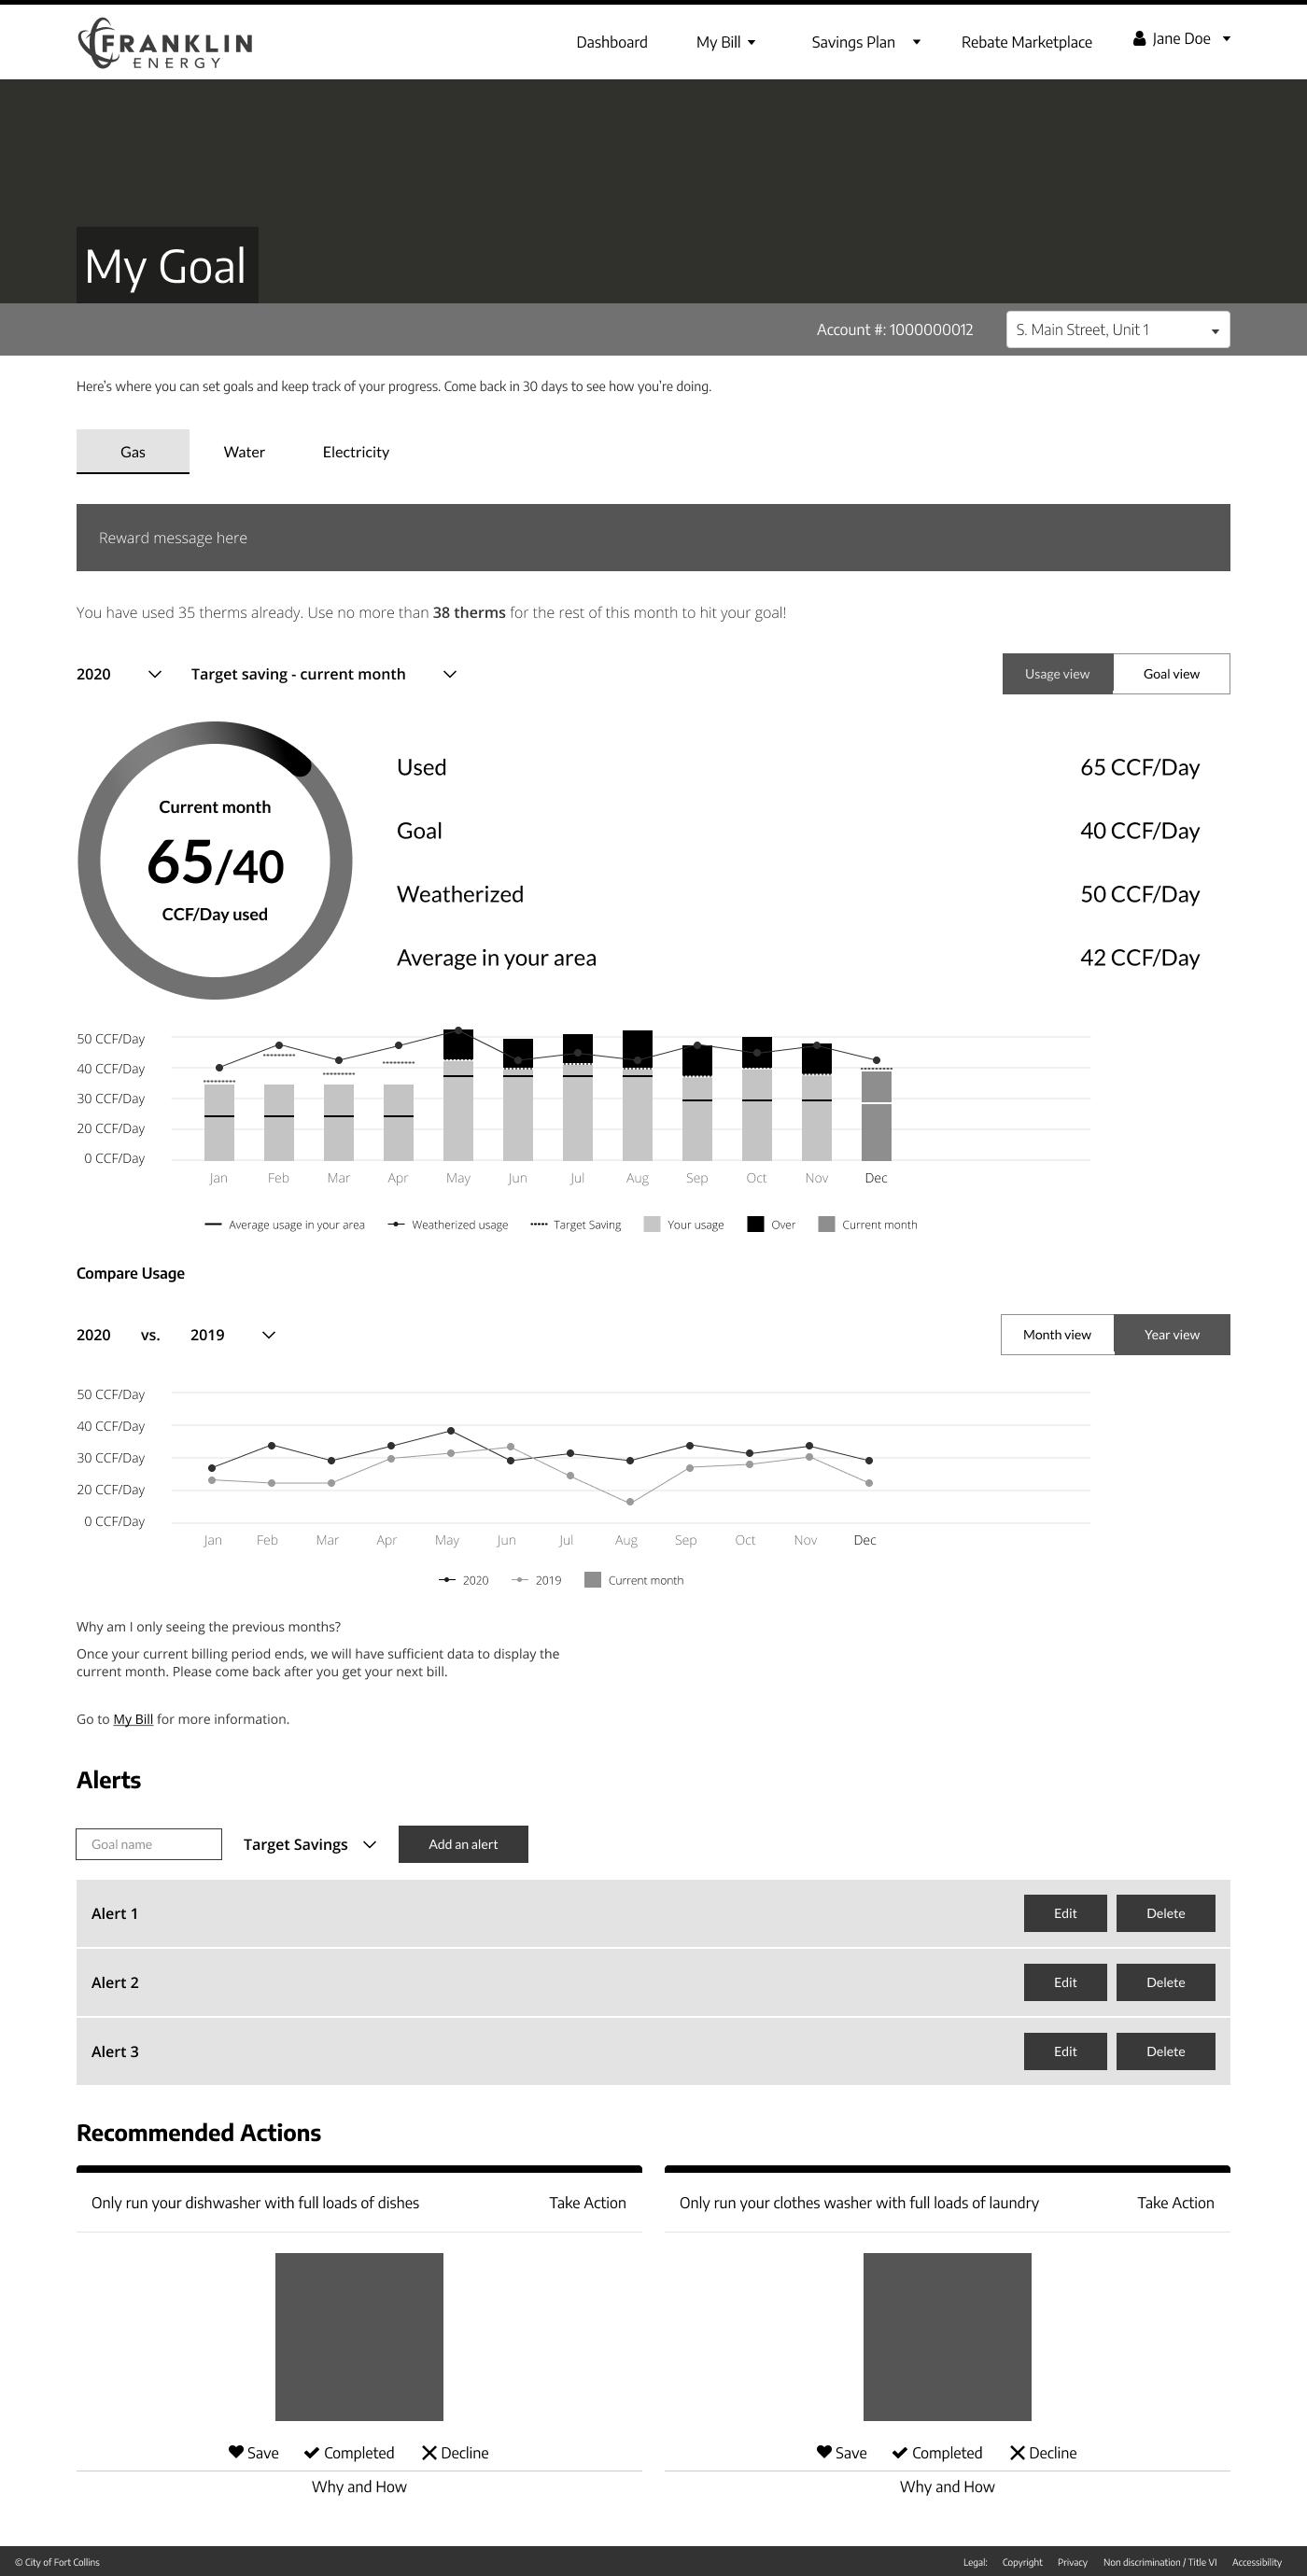 Data visualization design